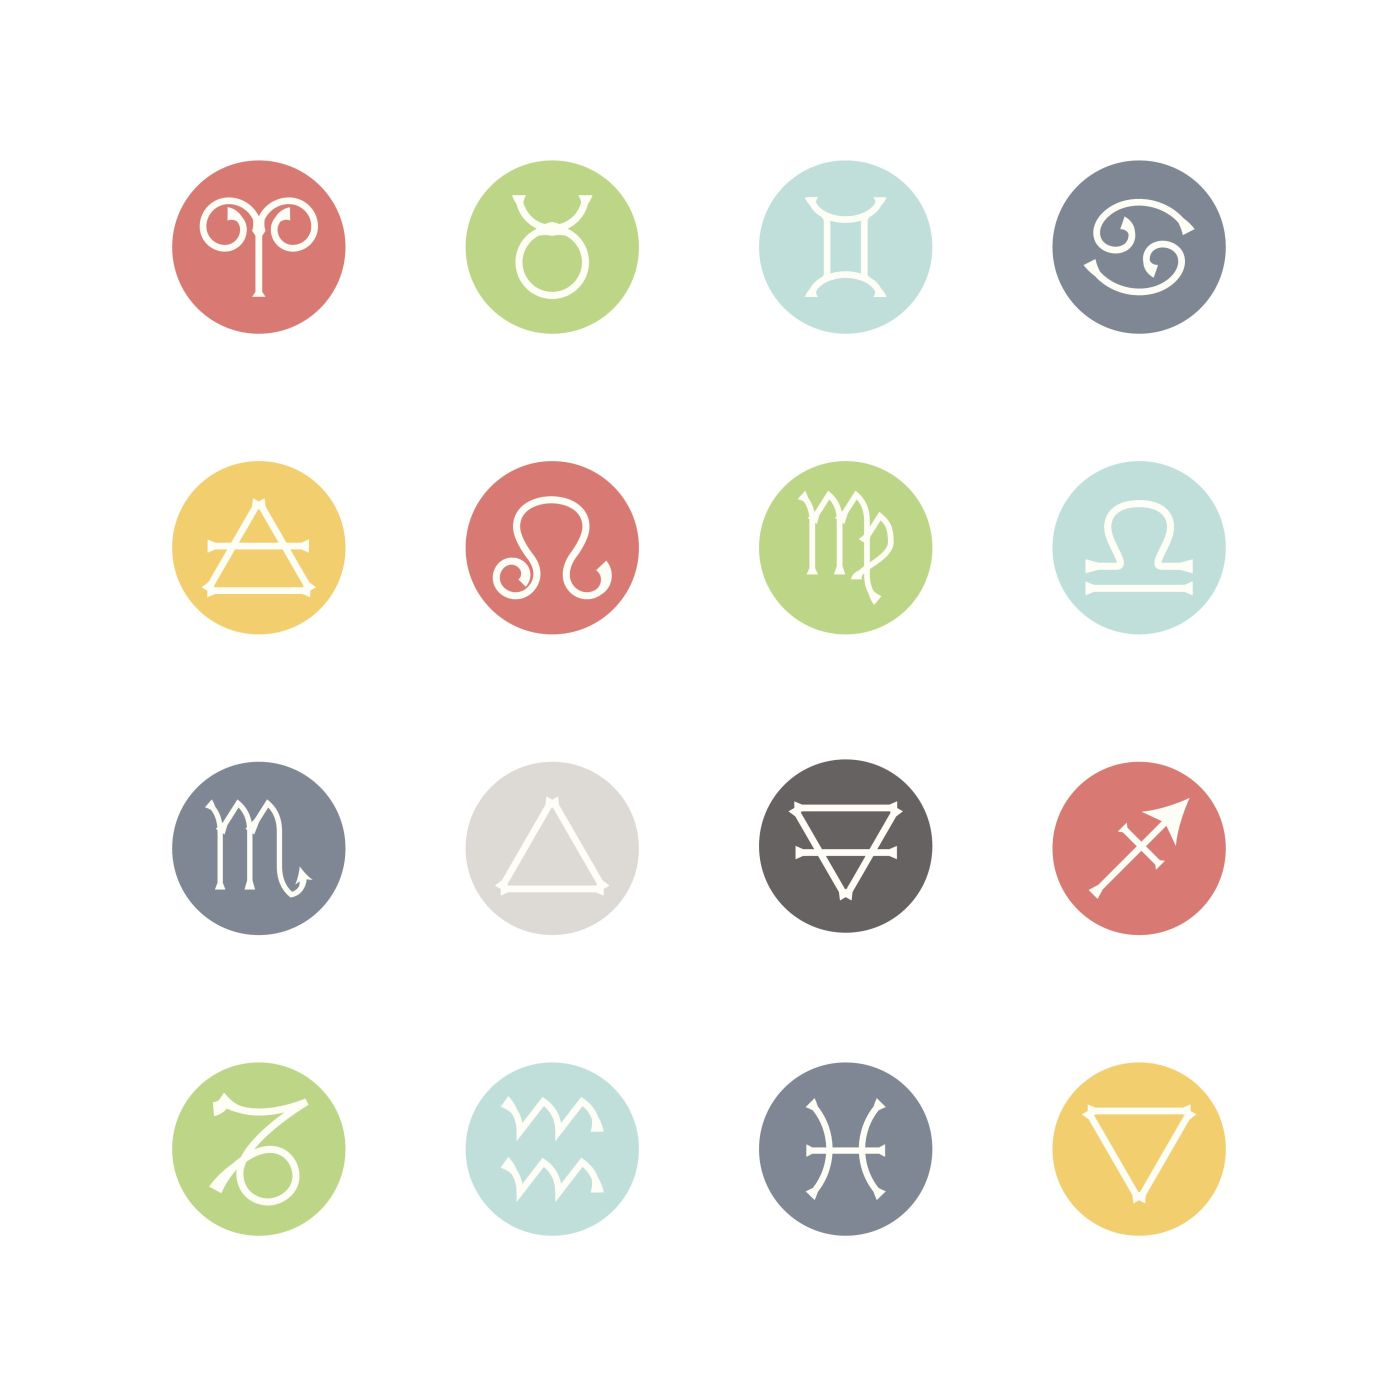 Horóscopo semanal: Predicción según cada signo del zodiaco